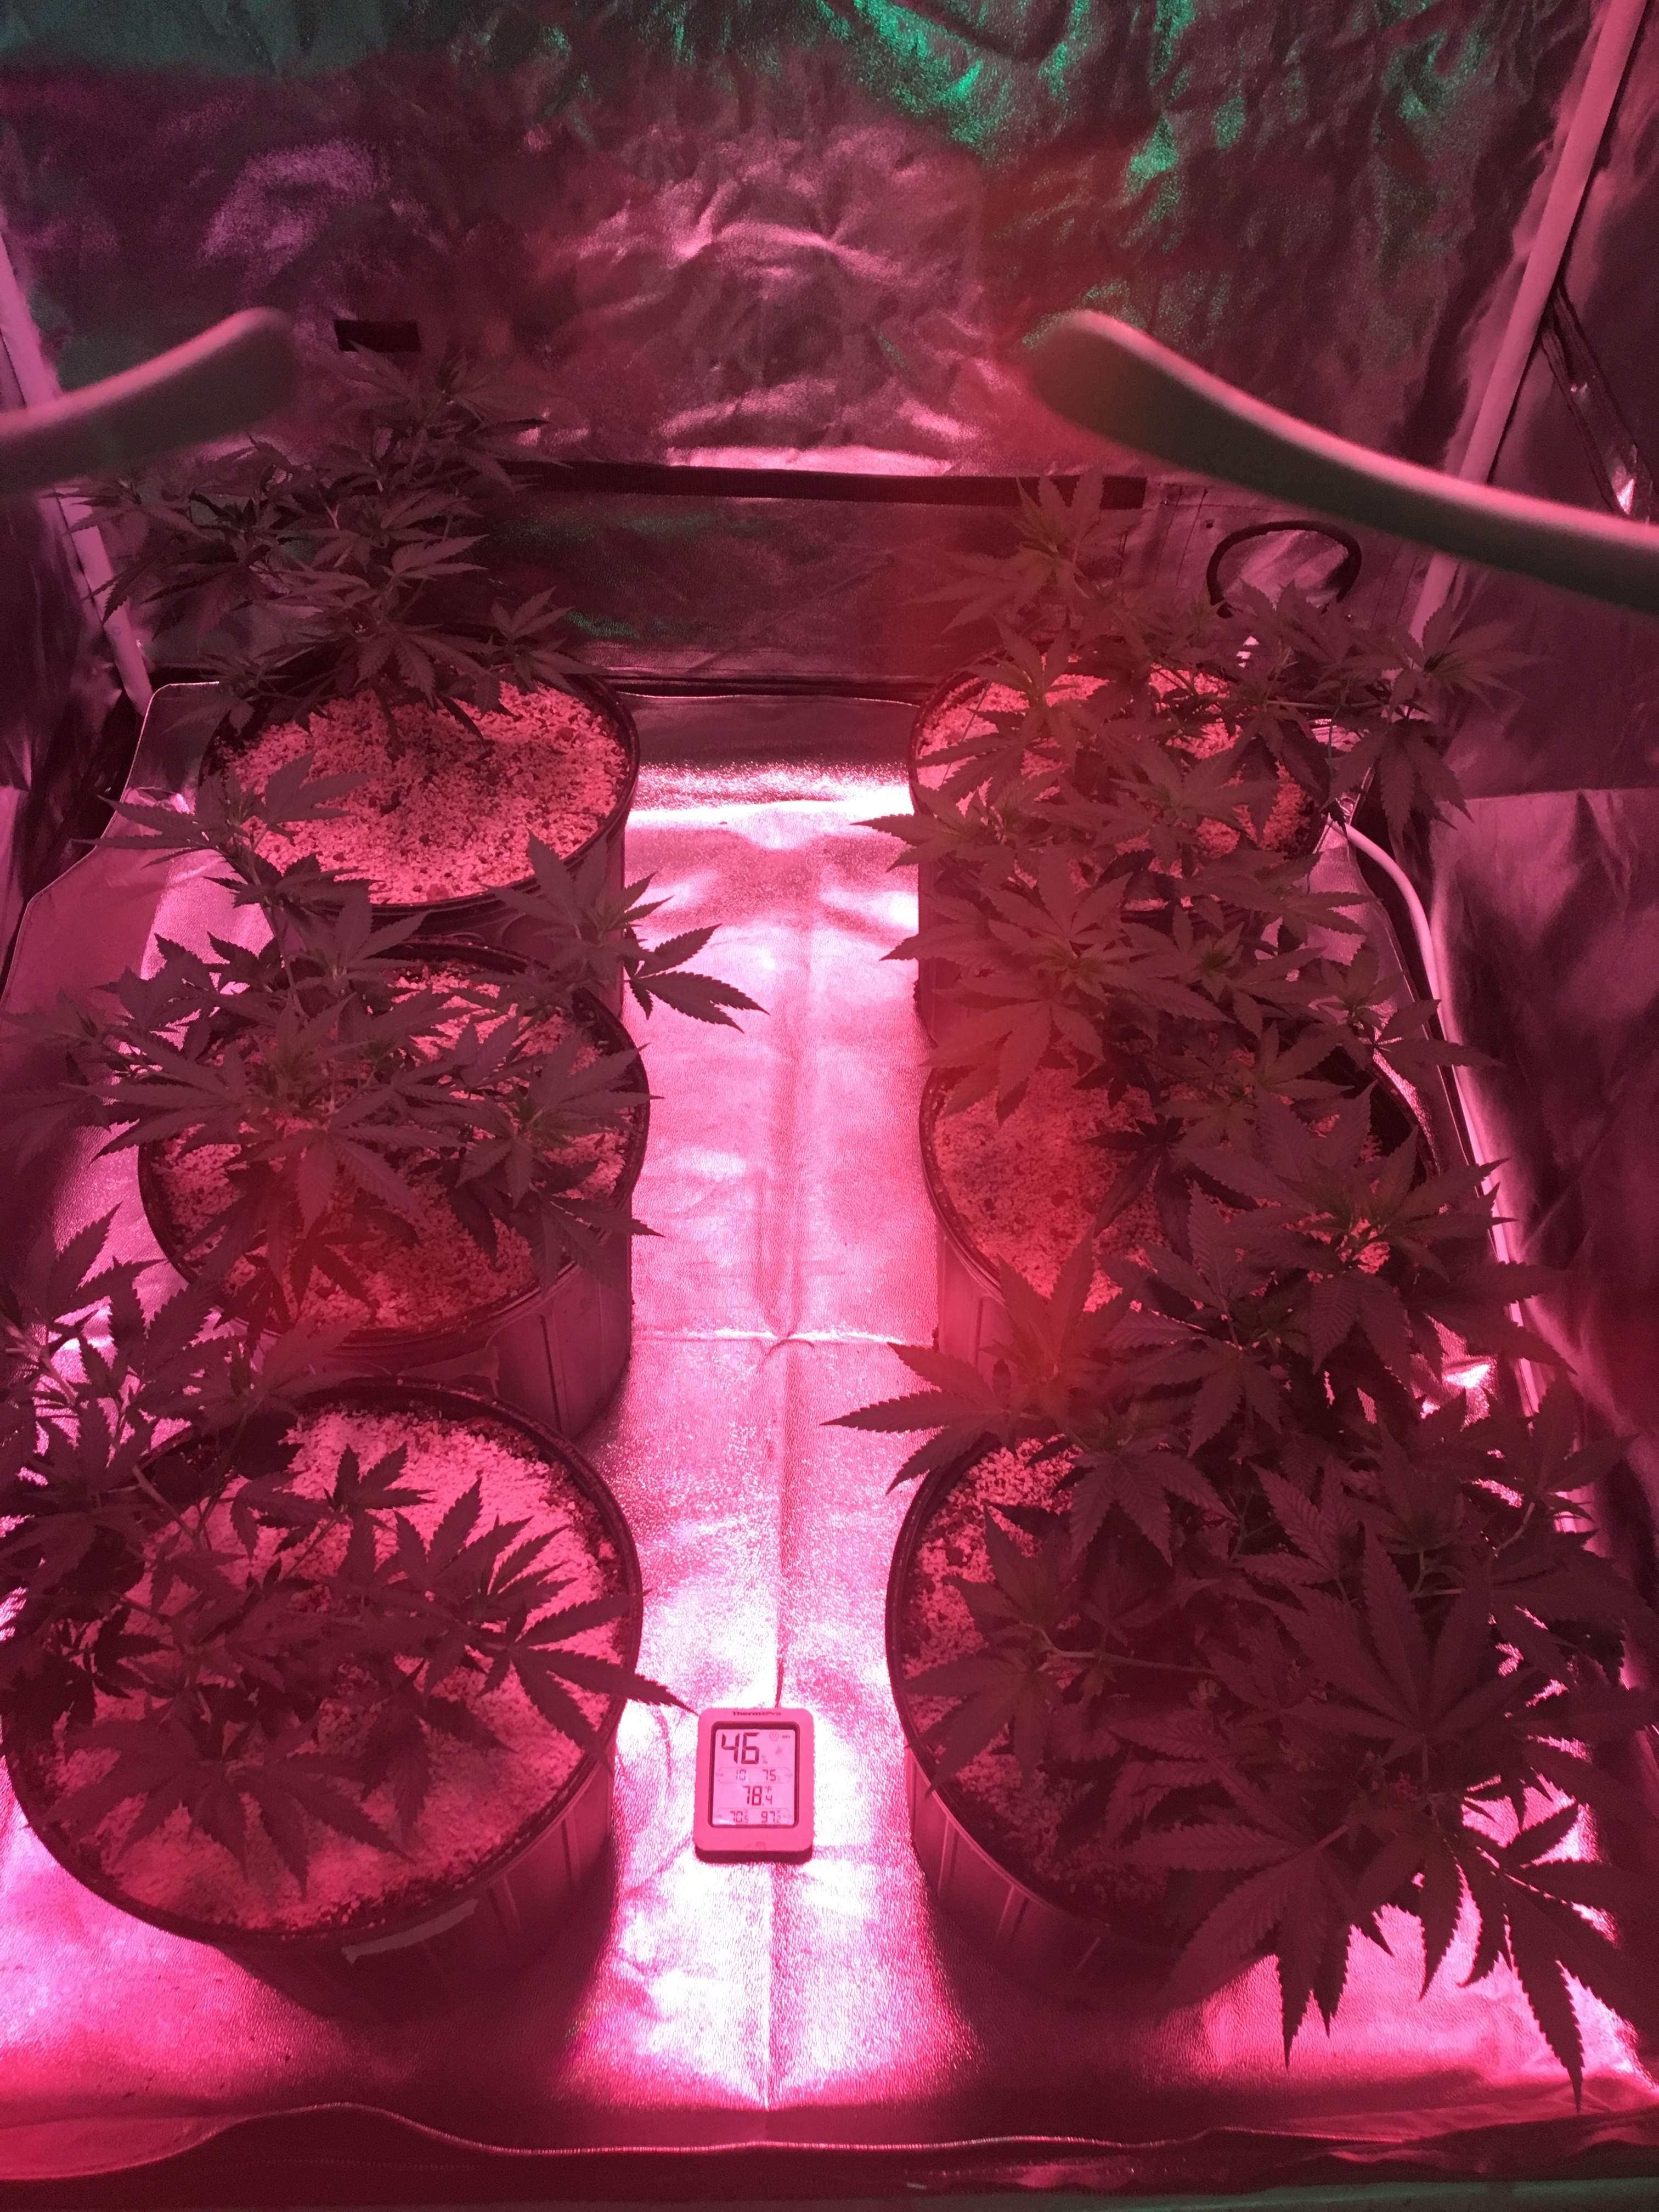 Day 1 in new tent will veg for one week here before Flower & Strawberry Kush 3 marijuana journal week10 by Fun_Growin - GrowDiaries